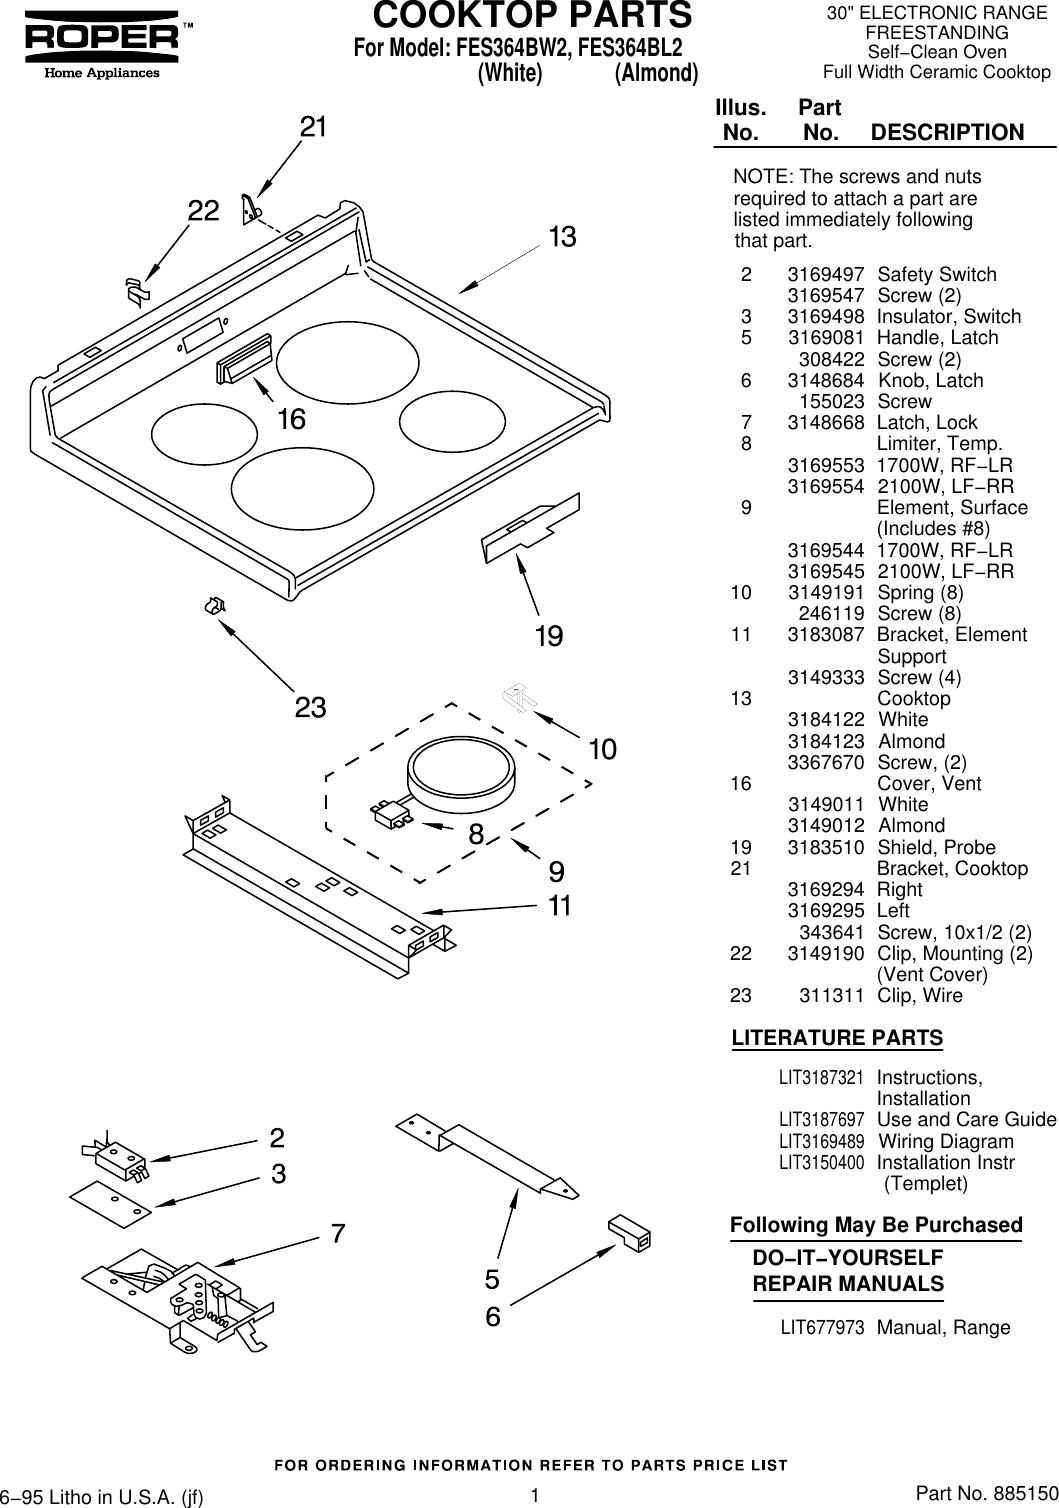 Roper Cooktop Fes364Bl2 Users Manual